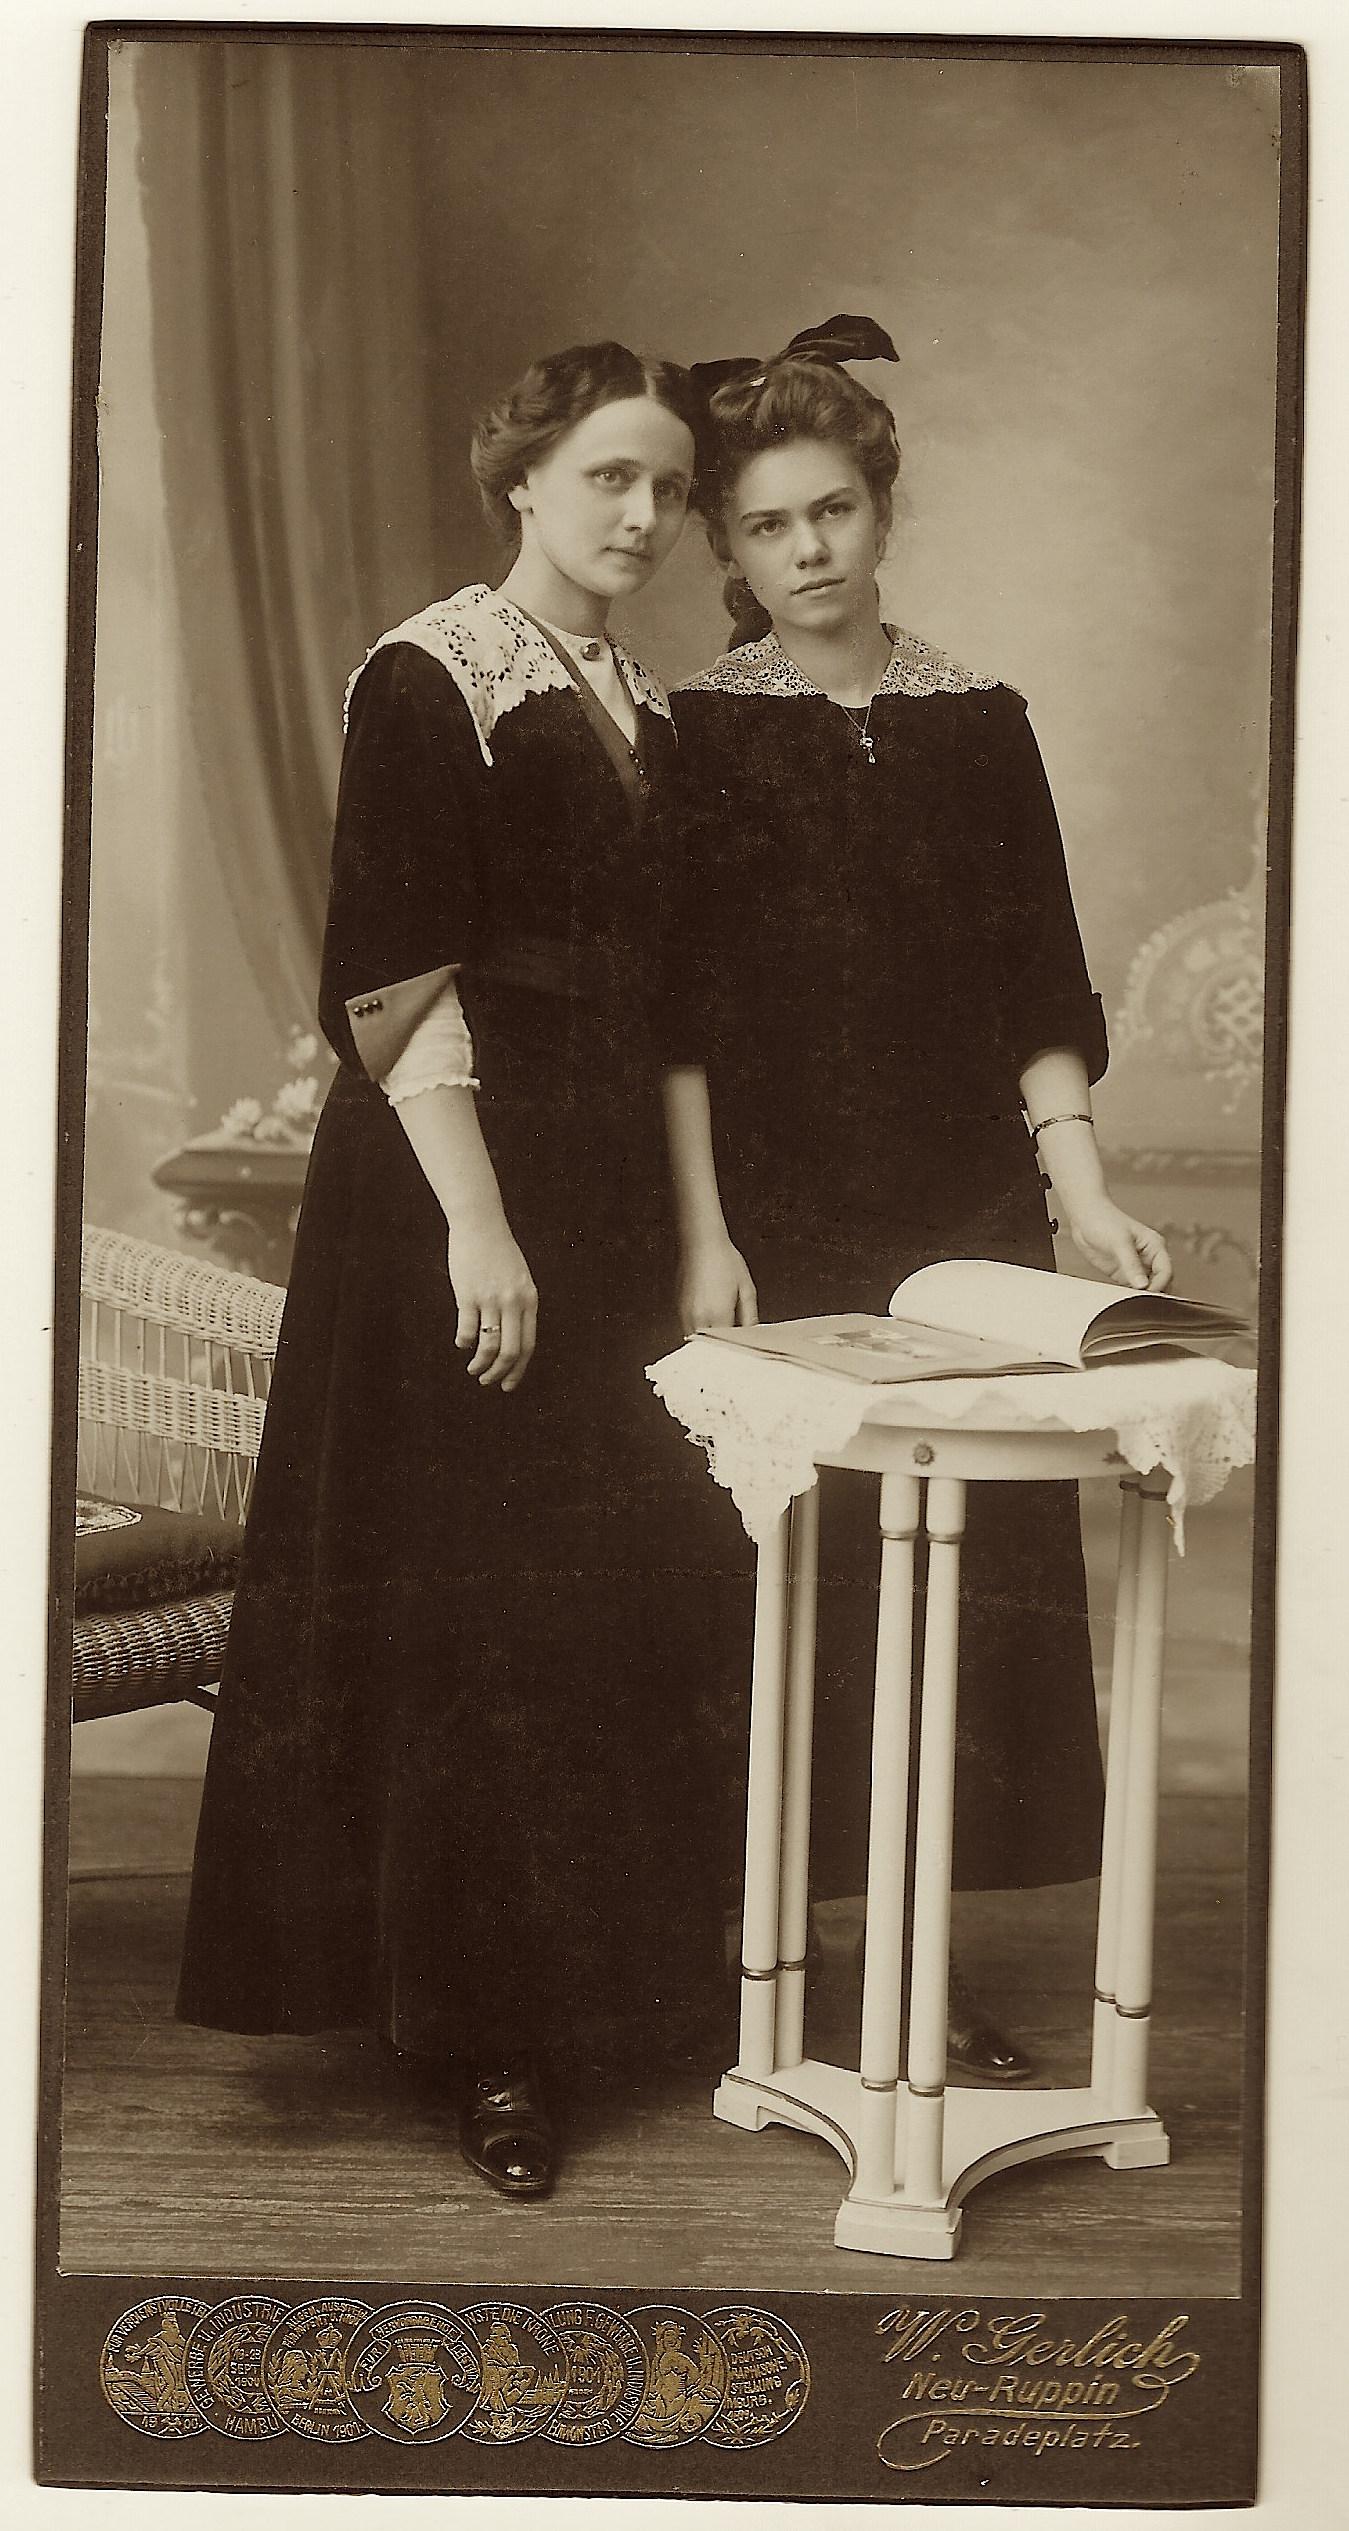 PHILADELPHIA LADIES